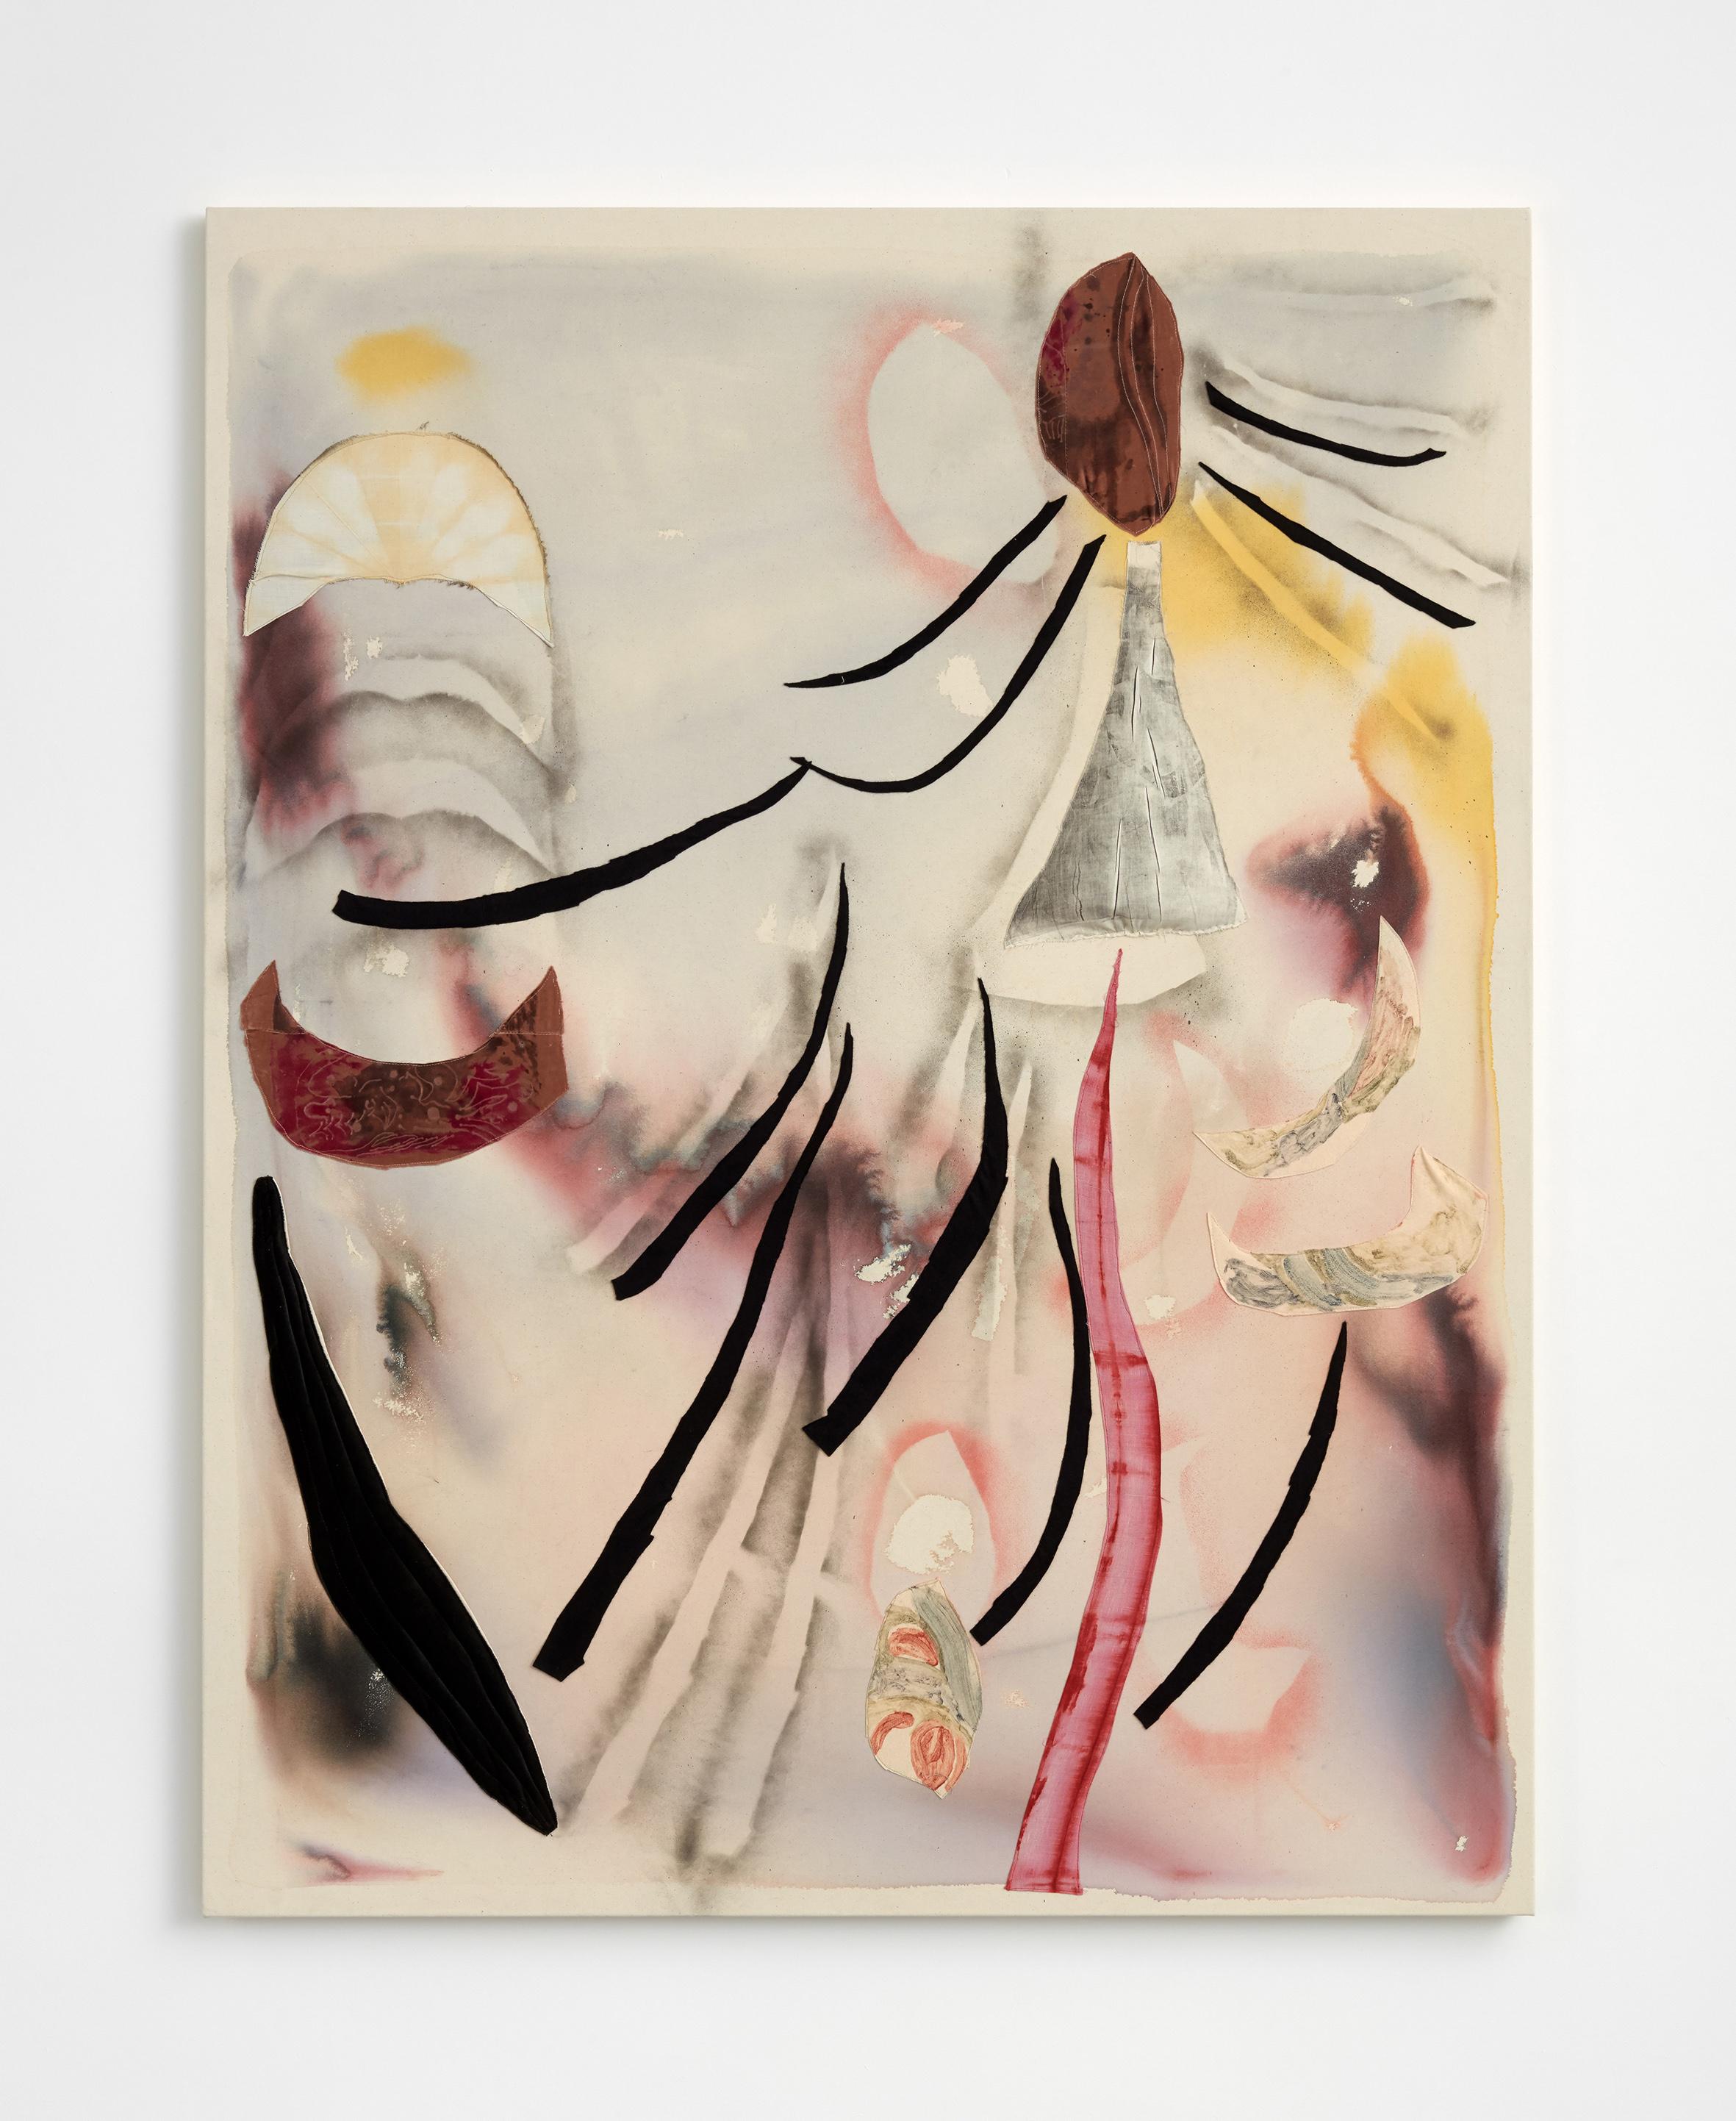 Aimée Parrott  Anthropocene view part 1, 2017  Ink, felt, velvet on canvas, 180 x 140 cm